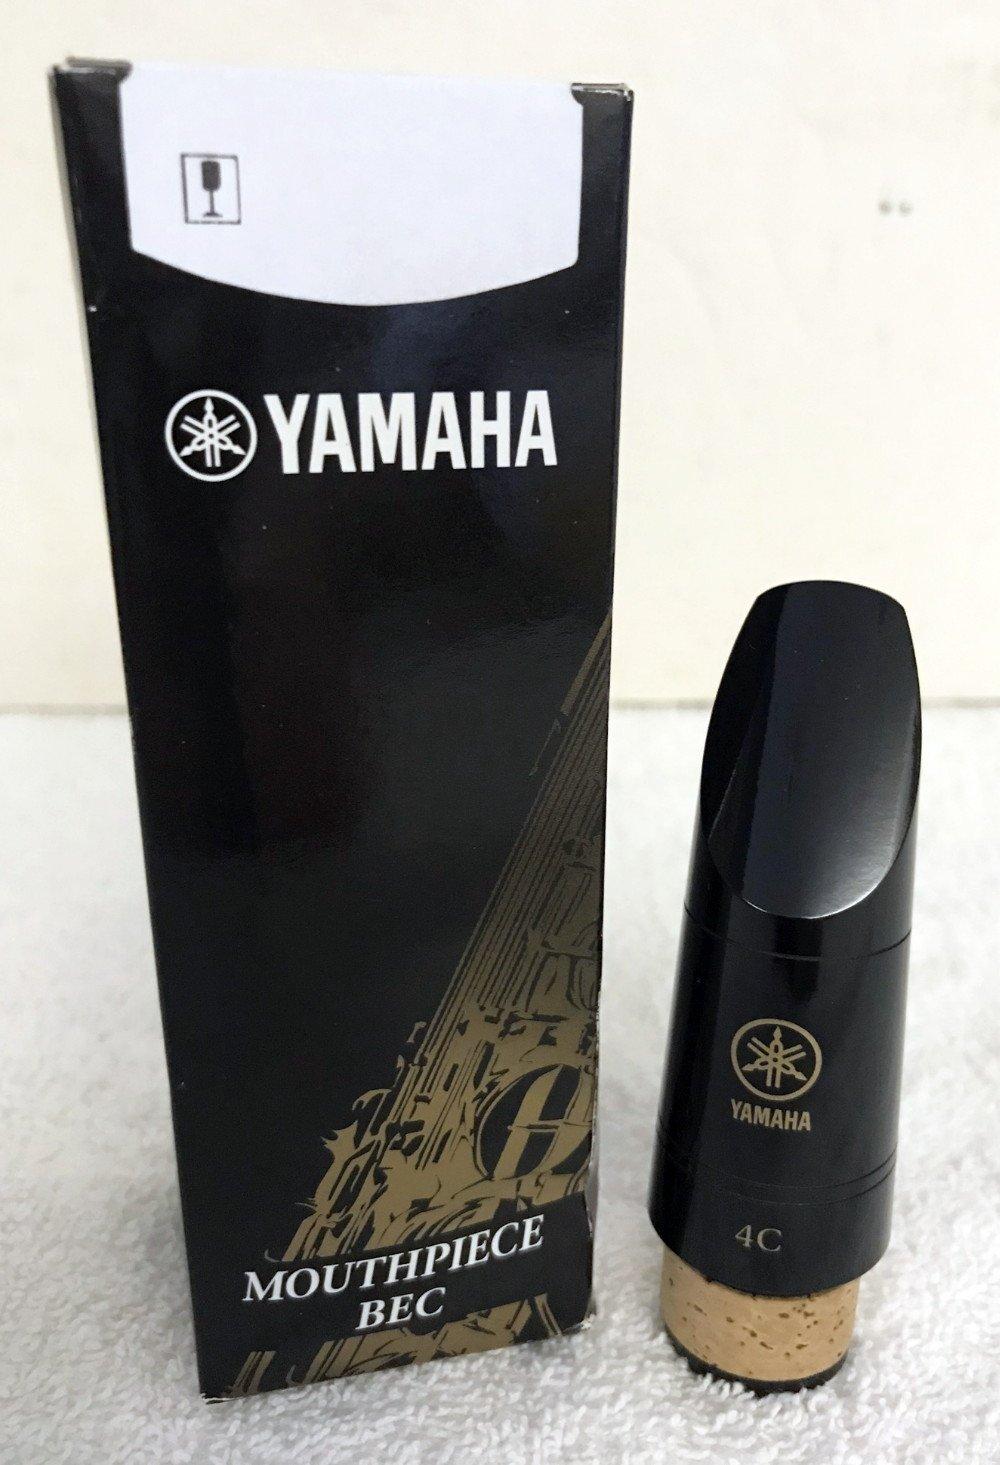 Yamaha Bb Clarinet Mouthpiece (4C)